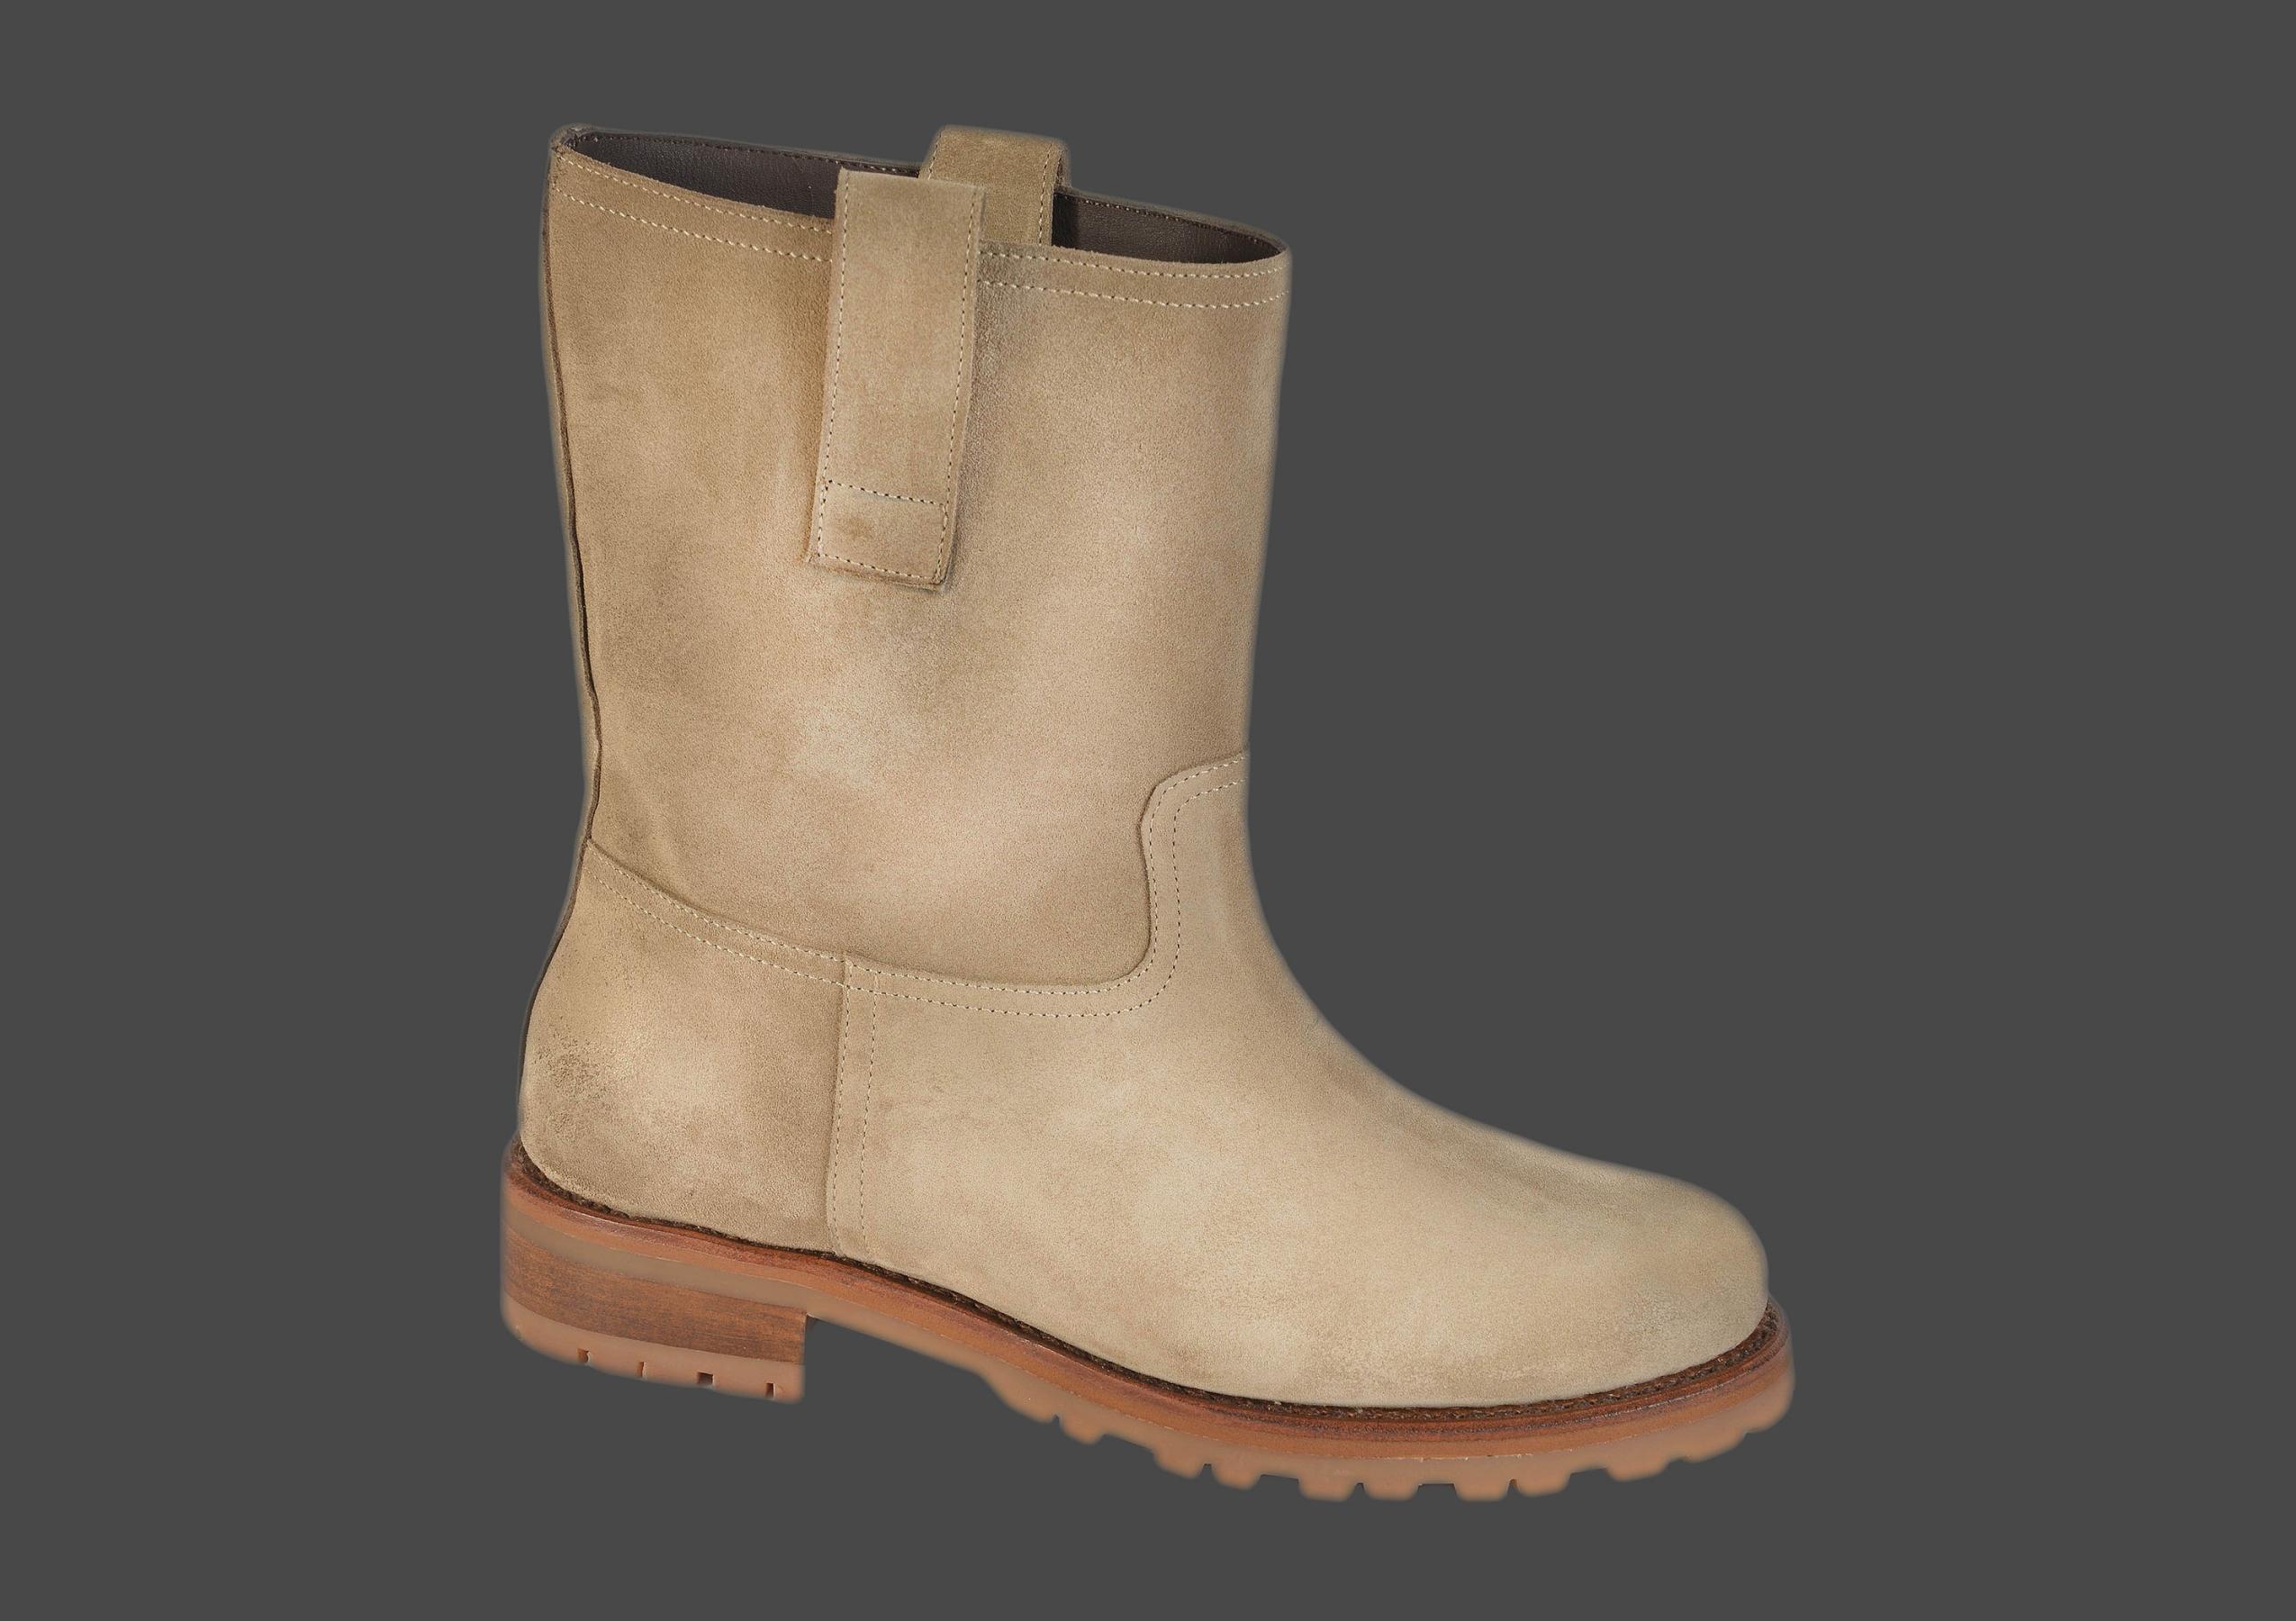 lina rock femme daim beige < rock boots f < shoes < our catalogue